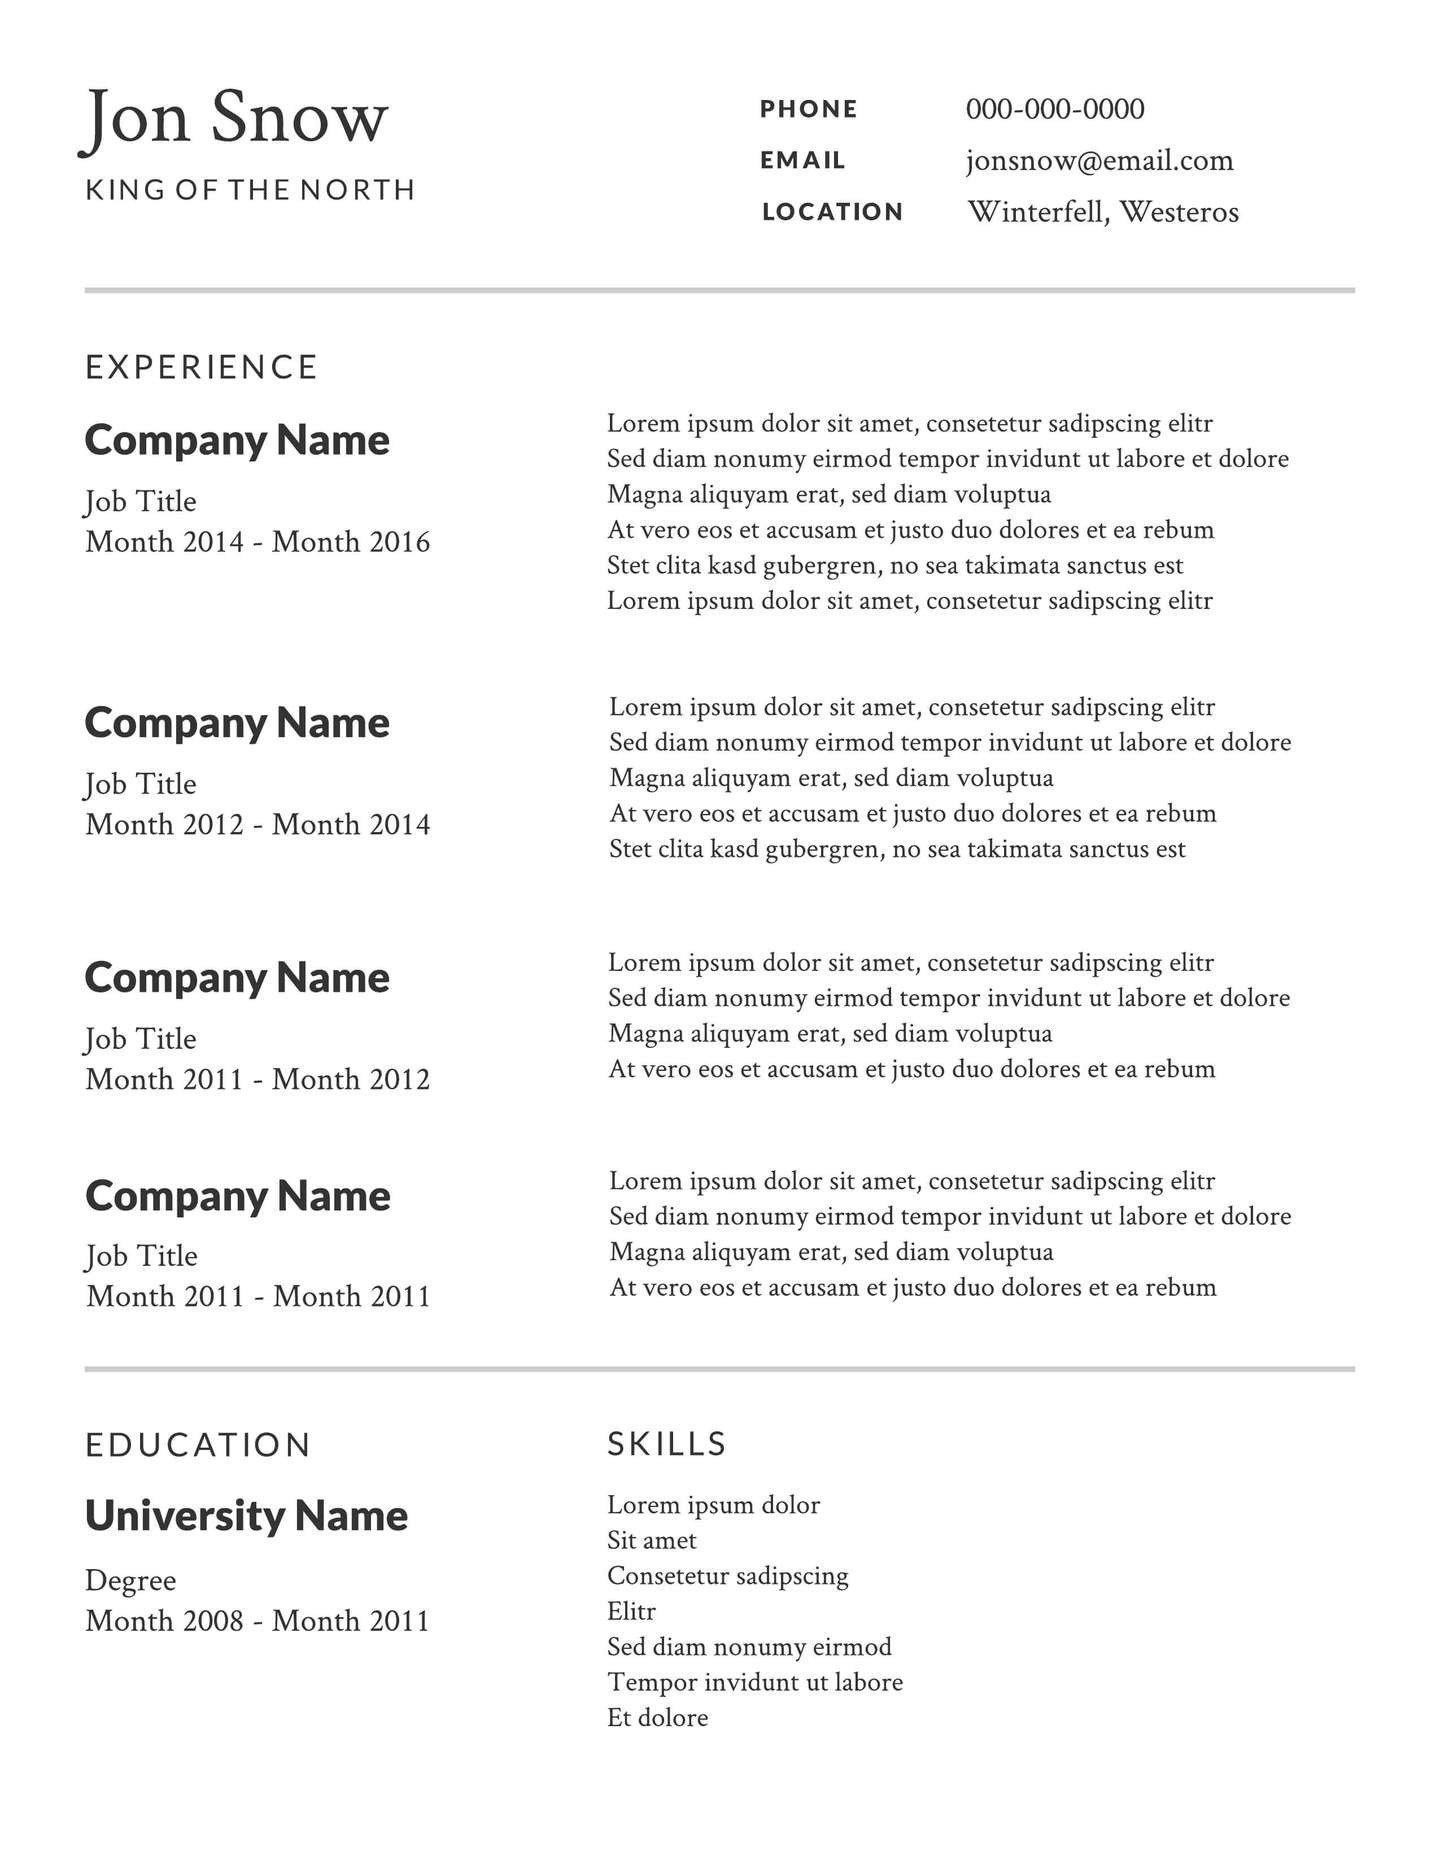 Free Printable Resume Templates 2 Free Resume Templates & Examples Lucidpress